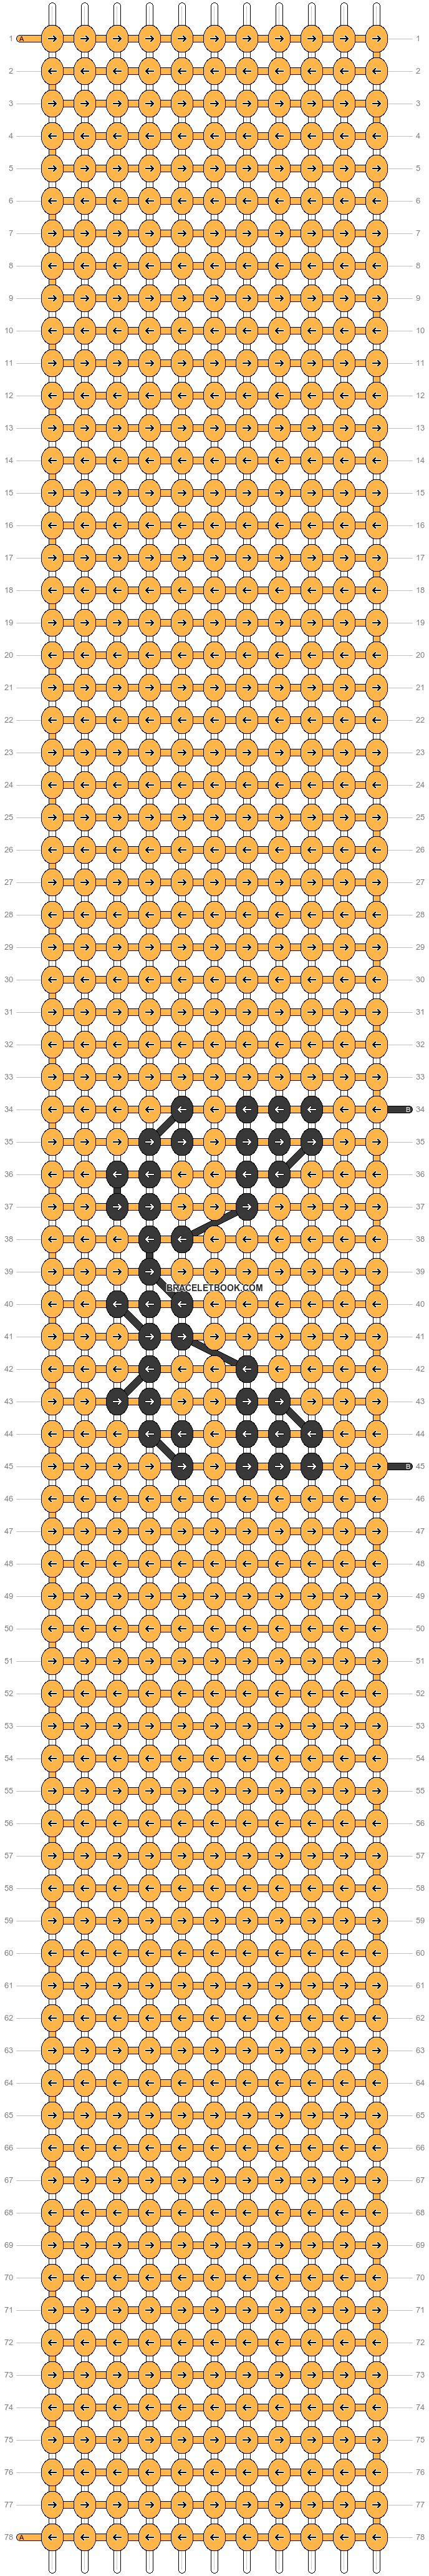 Alpha pattern #58838 pattern